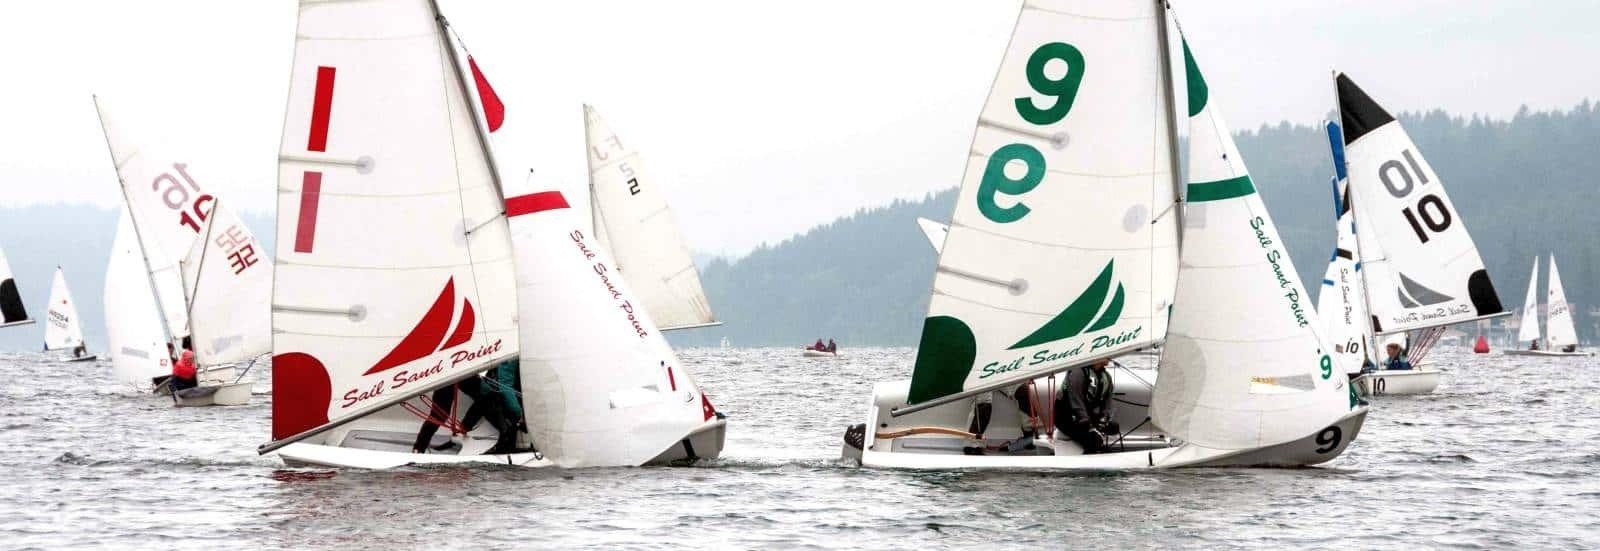 cat-homepage-banner-highschool-sailing-sail-sand-point-1600-550.jpeg